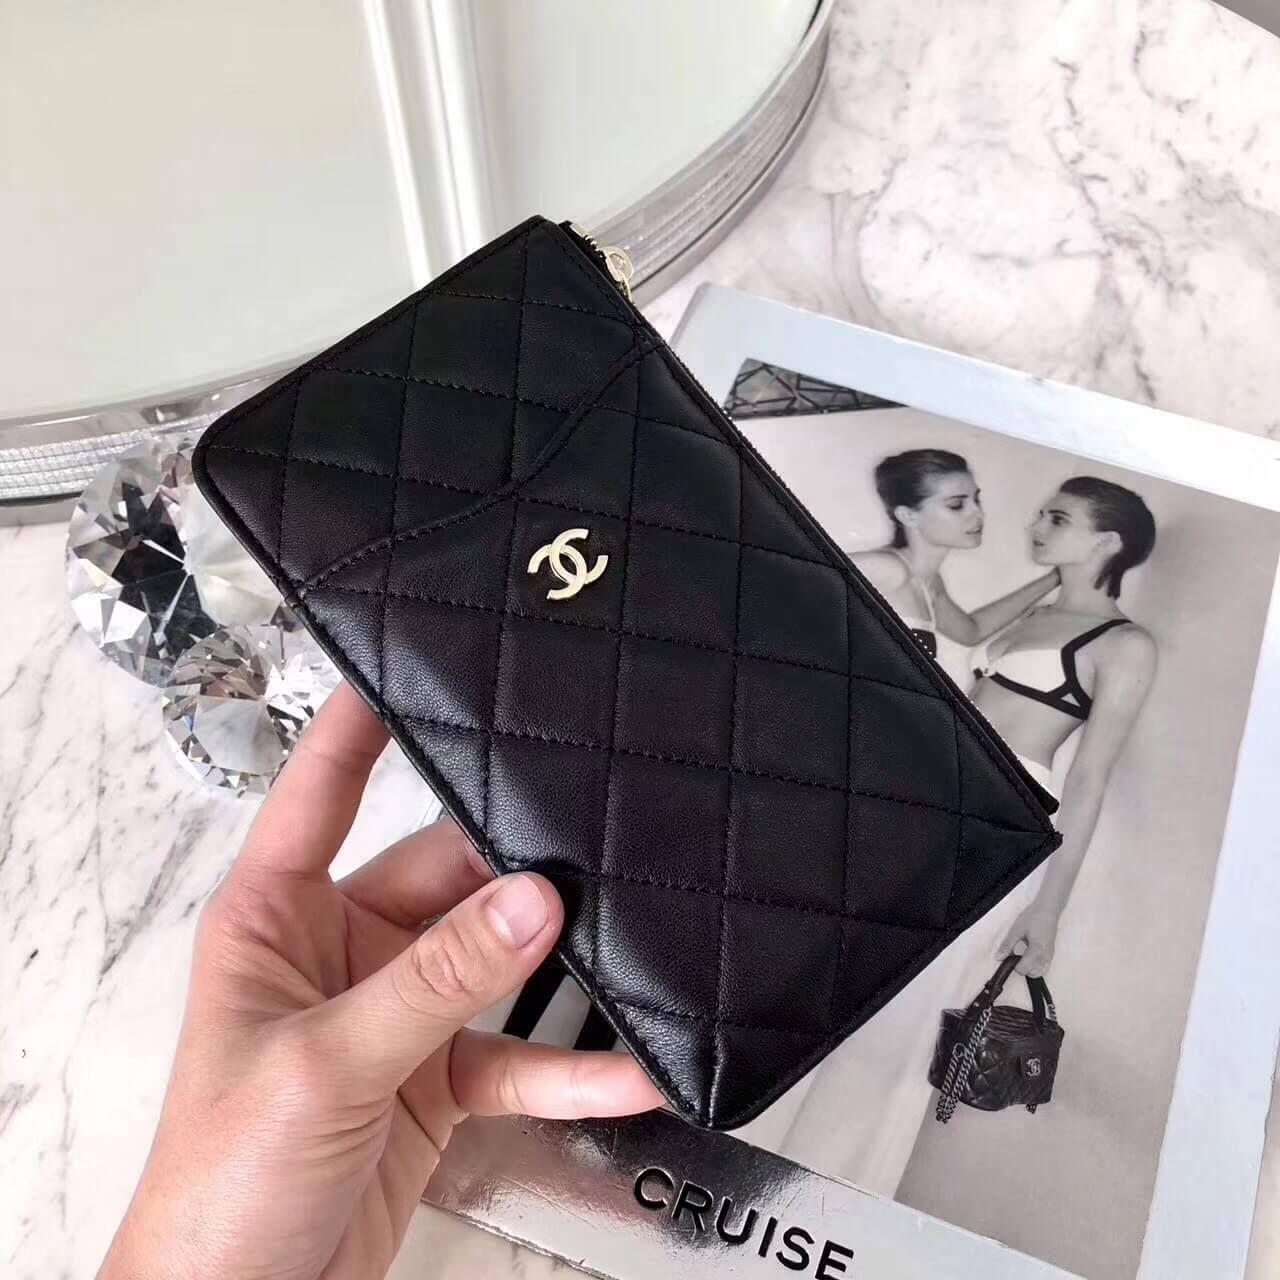 96ca4a13 Chanel Black Calfskin Classic Flat Wallet Pouch Phone Holder A84402 ...